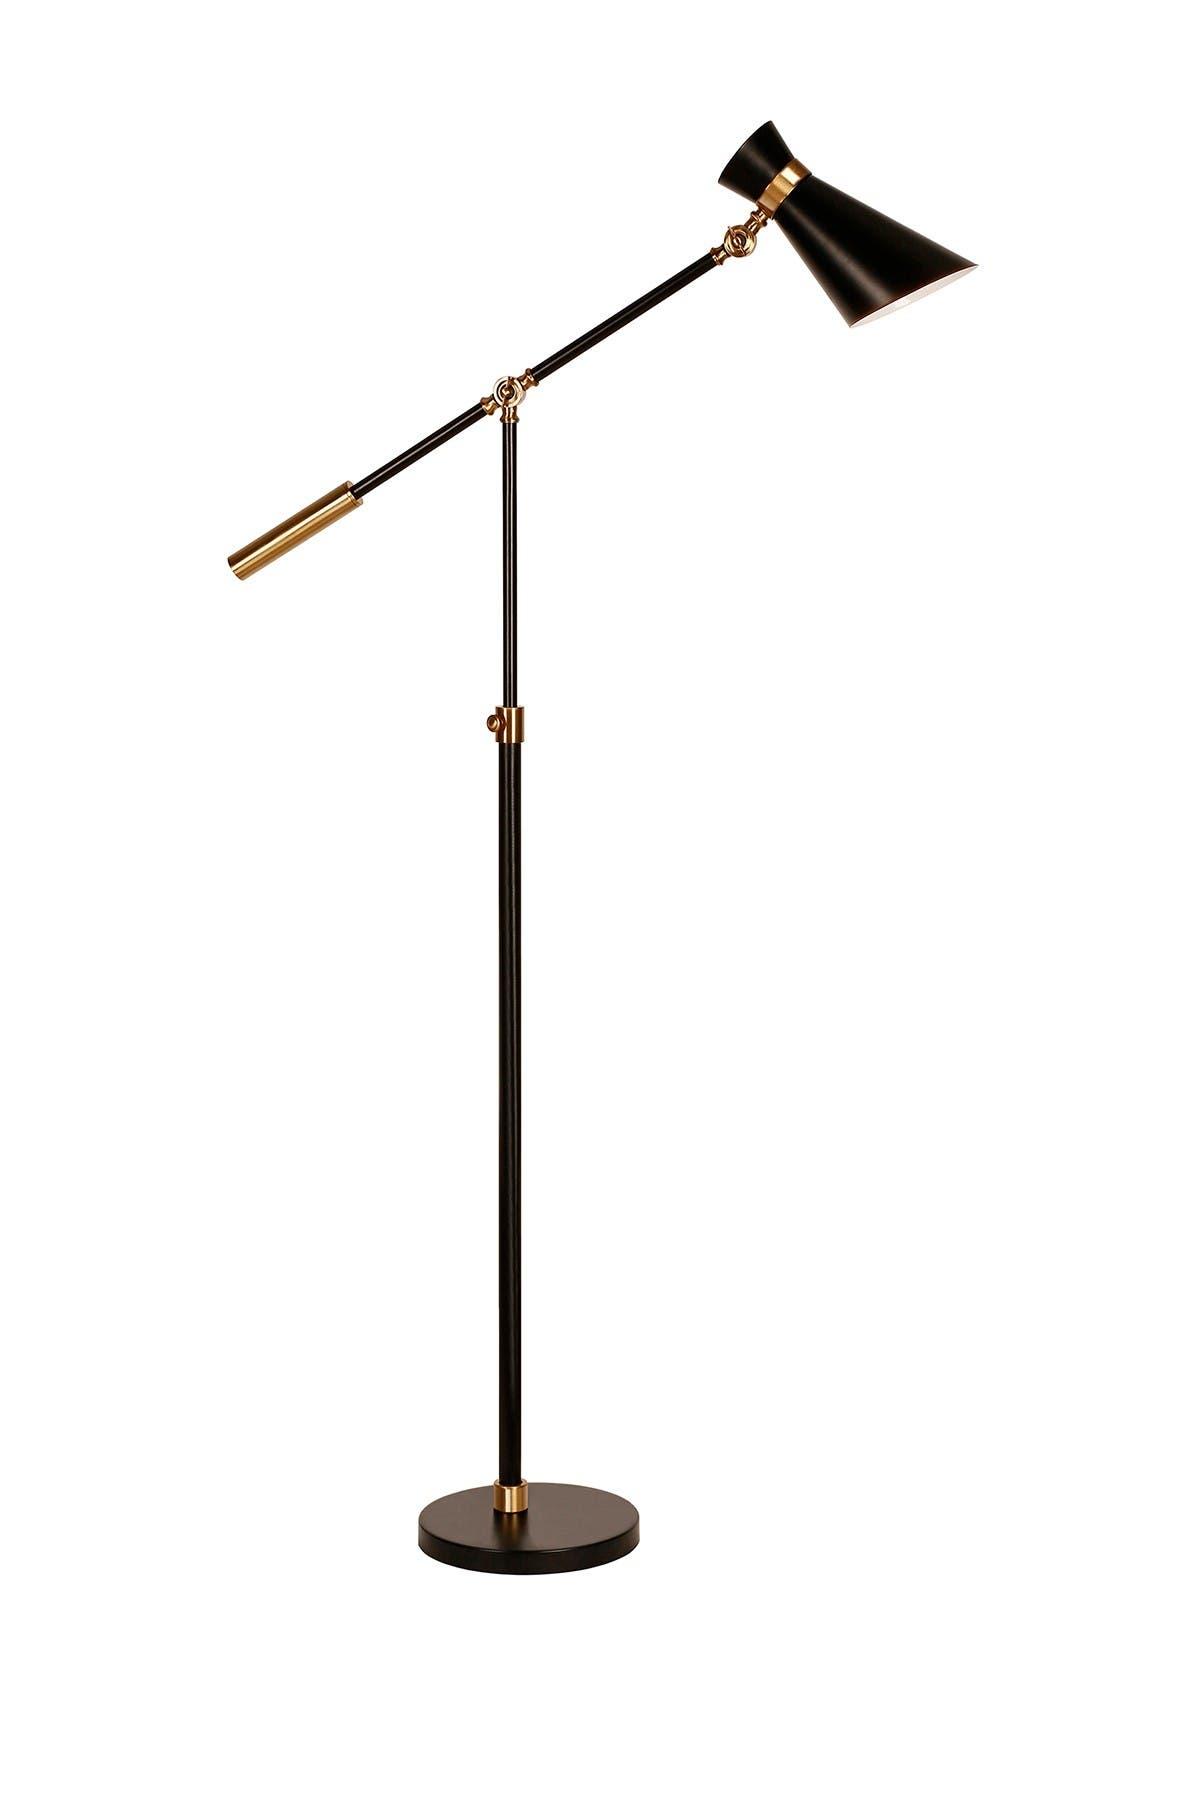 Image of Addison and Lane Rex Floor Lamp     Black/Brass